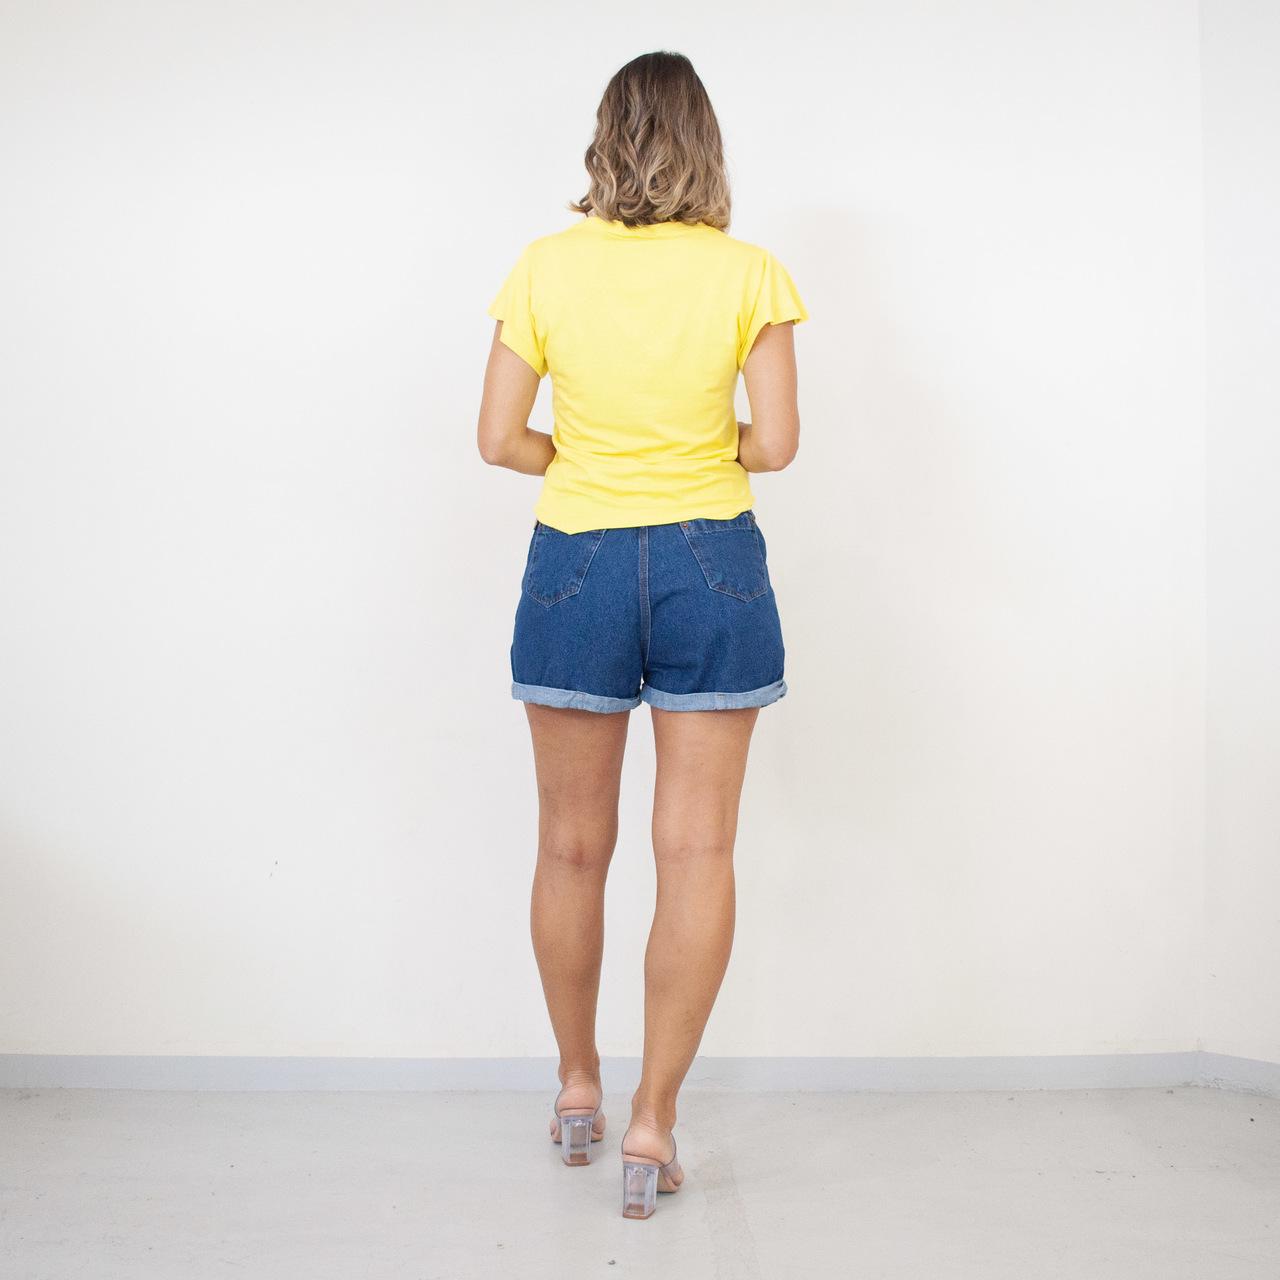 T-Shirt Viscolycra Gola V - Mademoiselle - Amarela